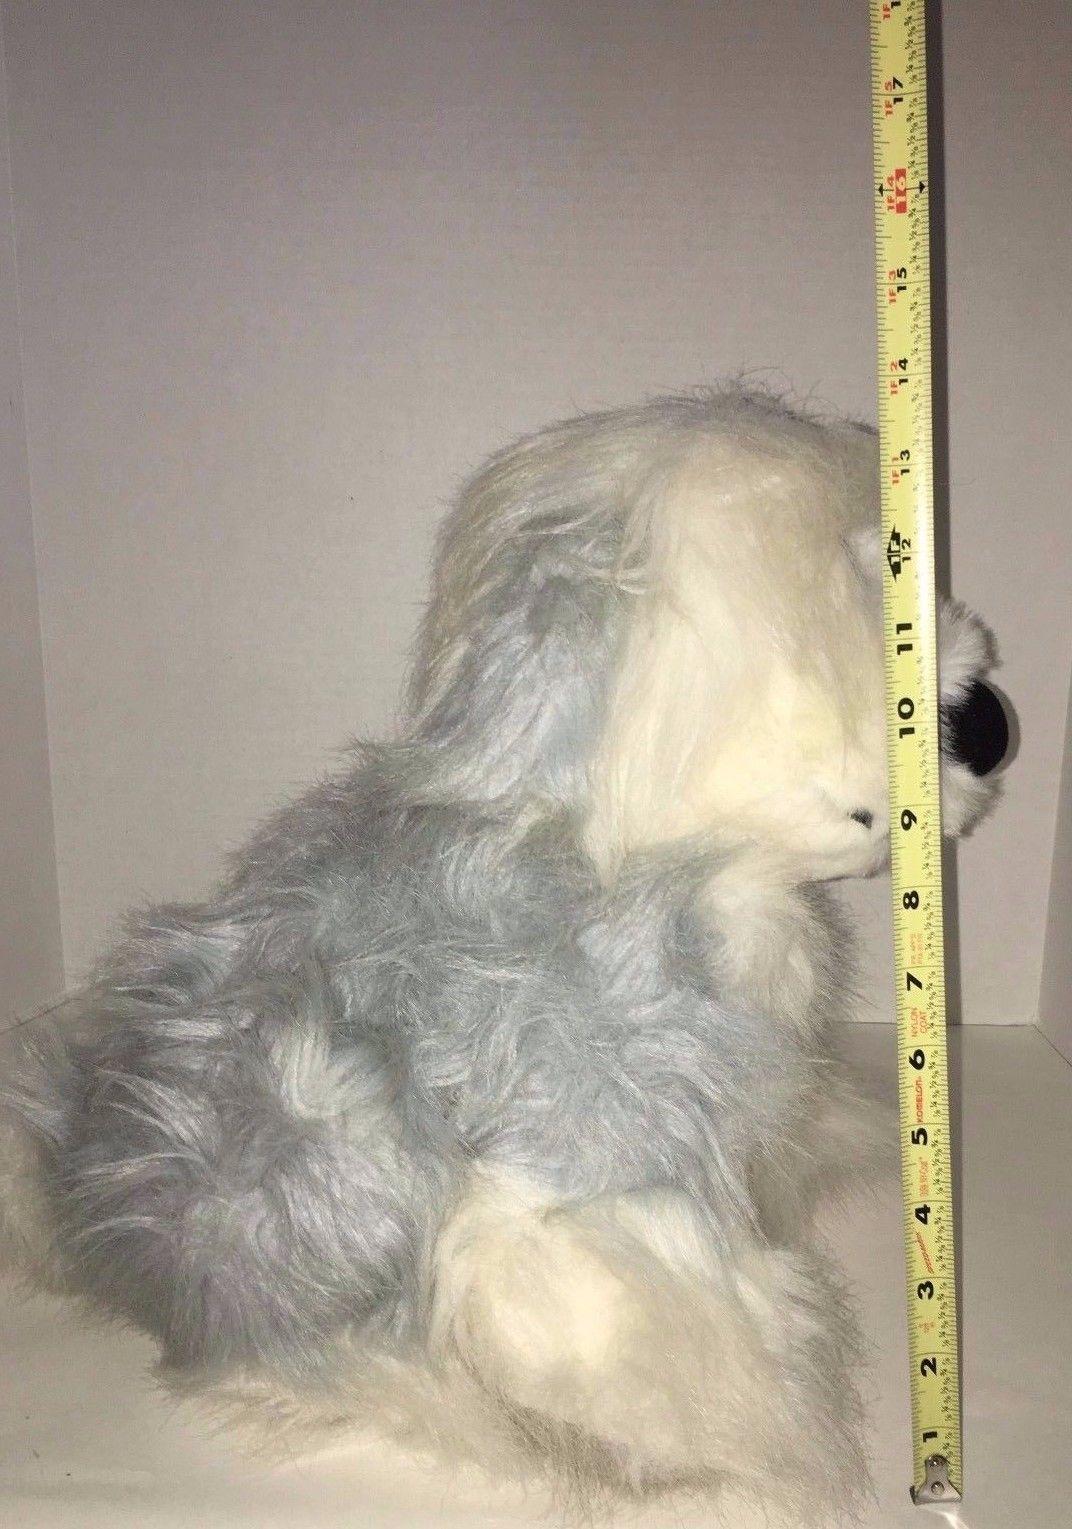 "Disney Little Mermaid Max Dog Plush 14"" Old English Sheep Dog Shaggy gray"